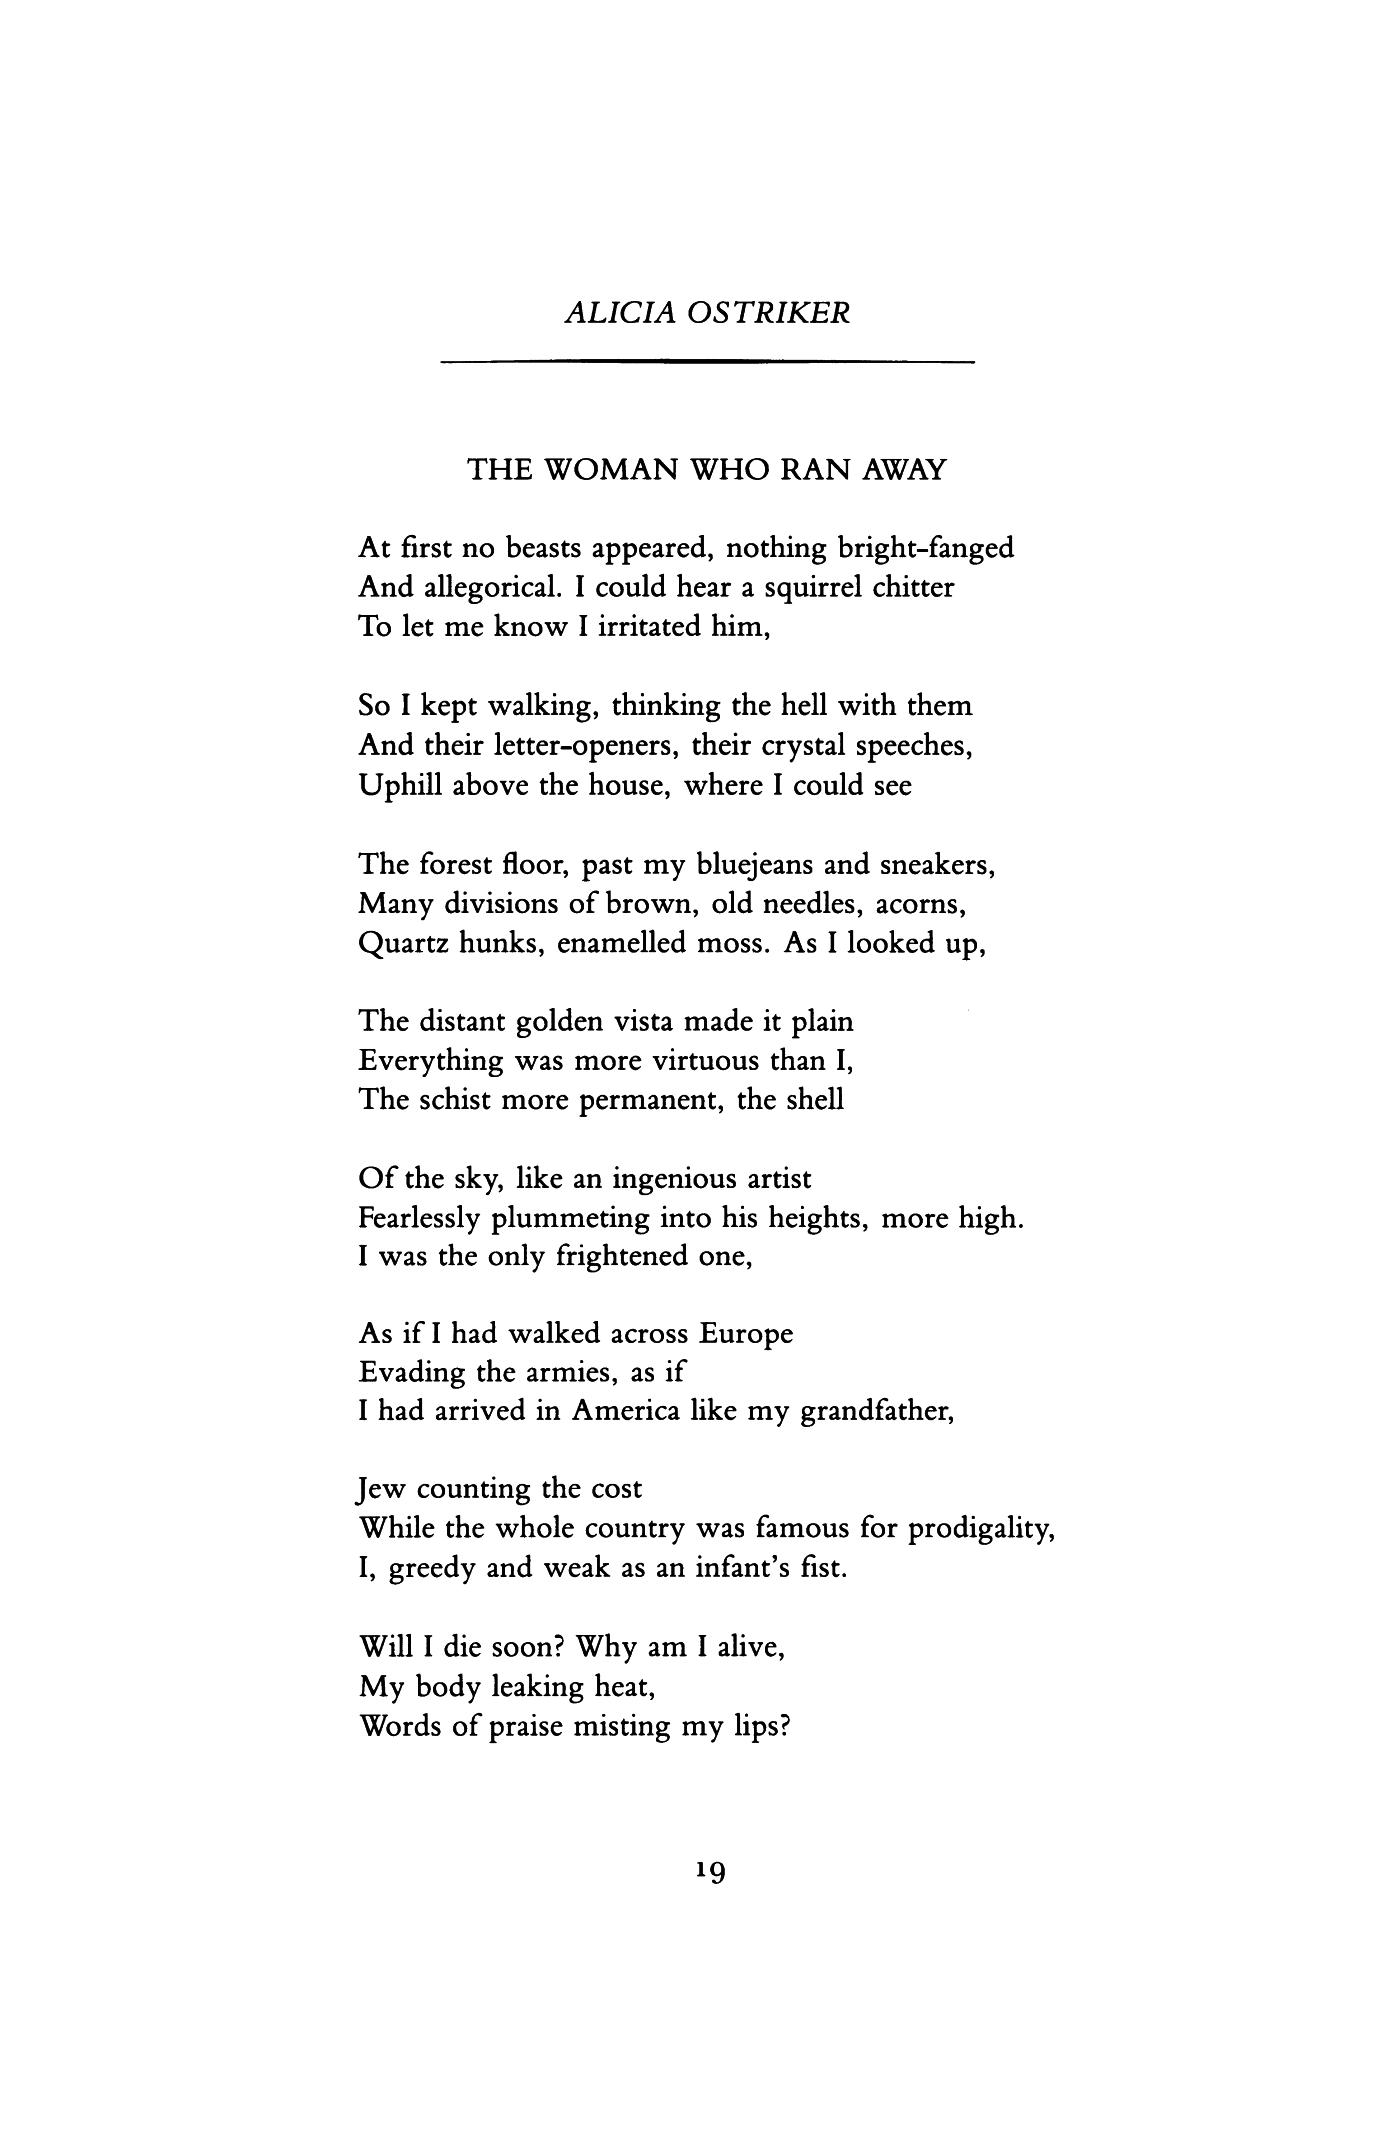 uphill poem allegory